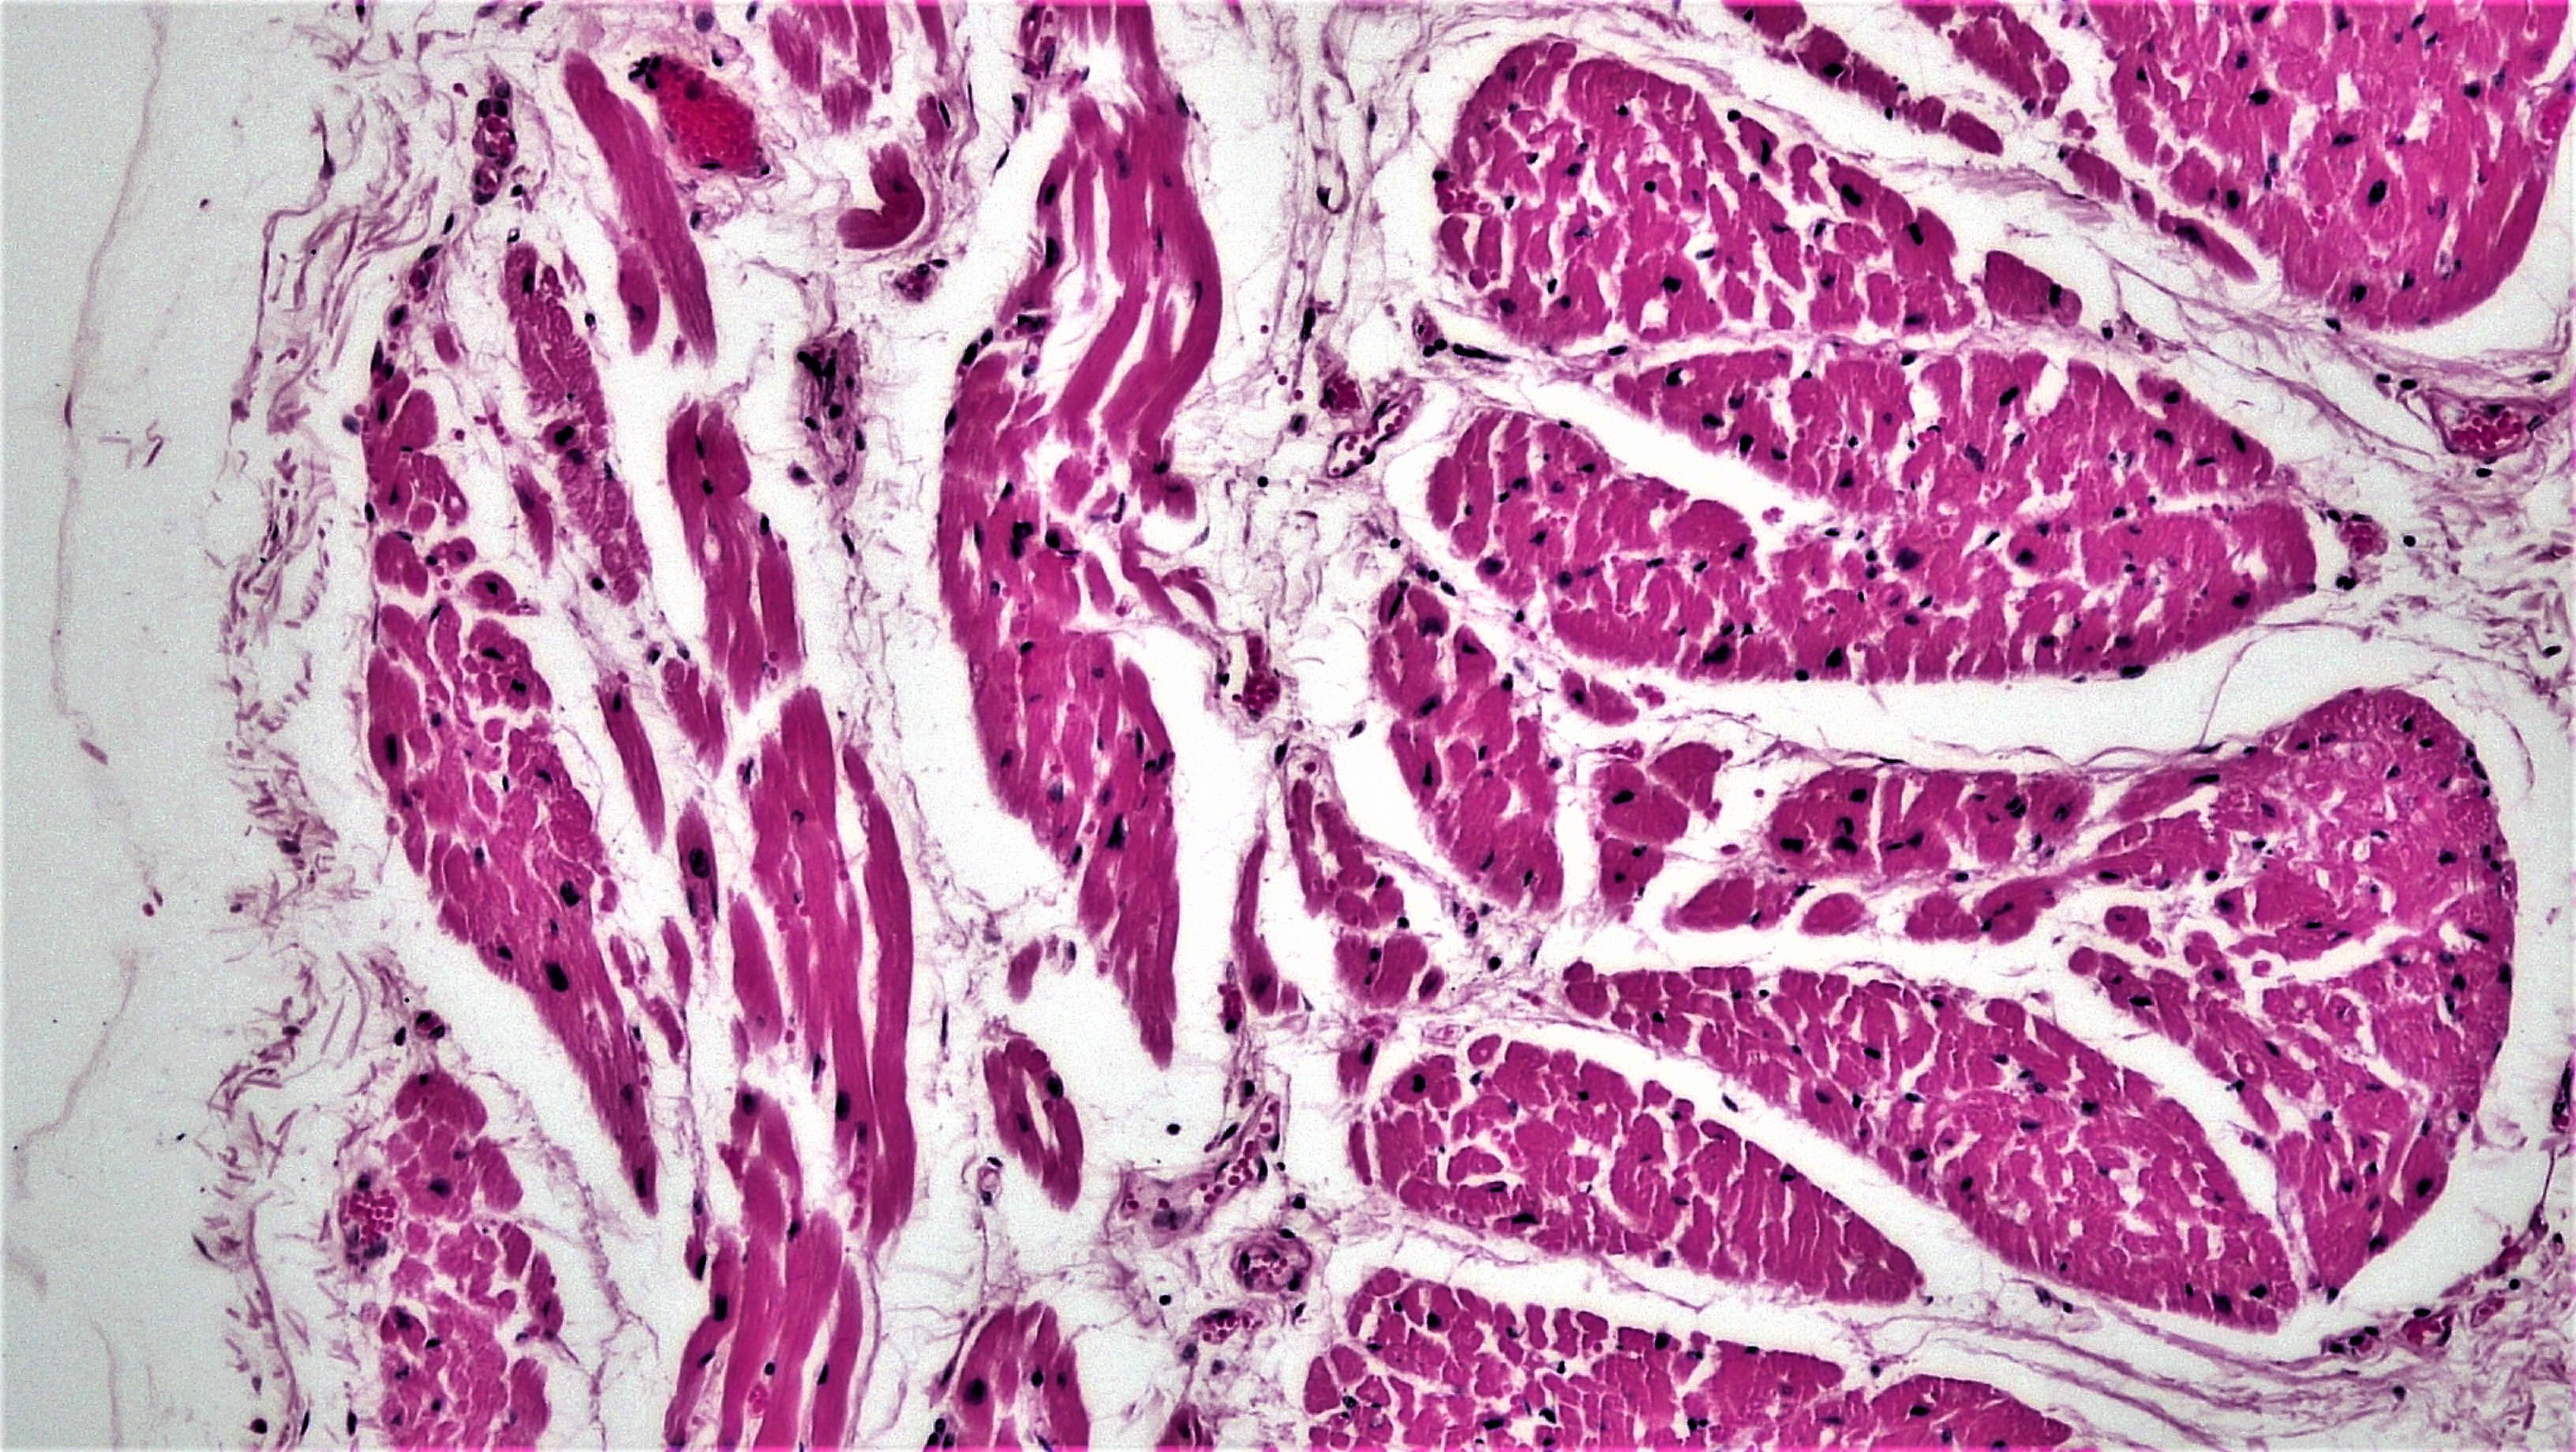 Filemuscle Tissue Cardiac Muscle 27187637147g Wikimedia Commons